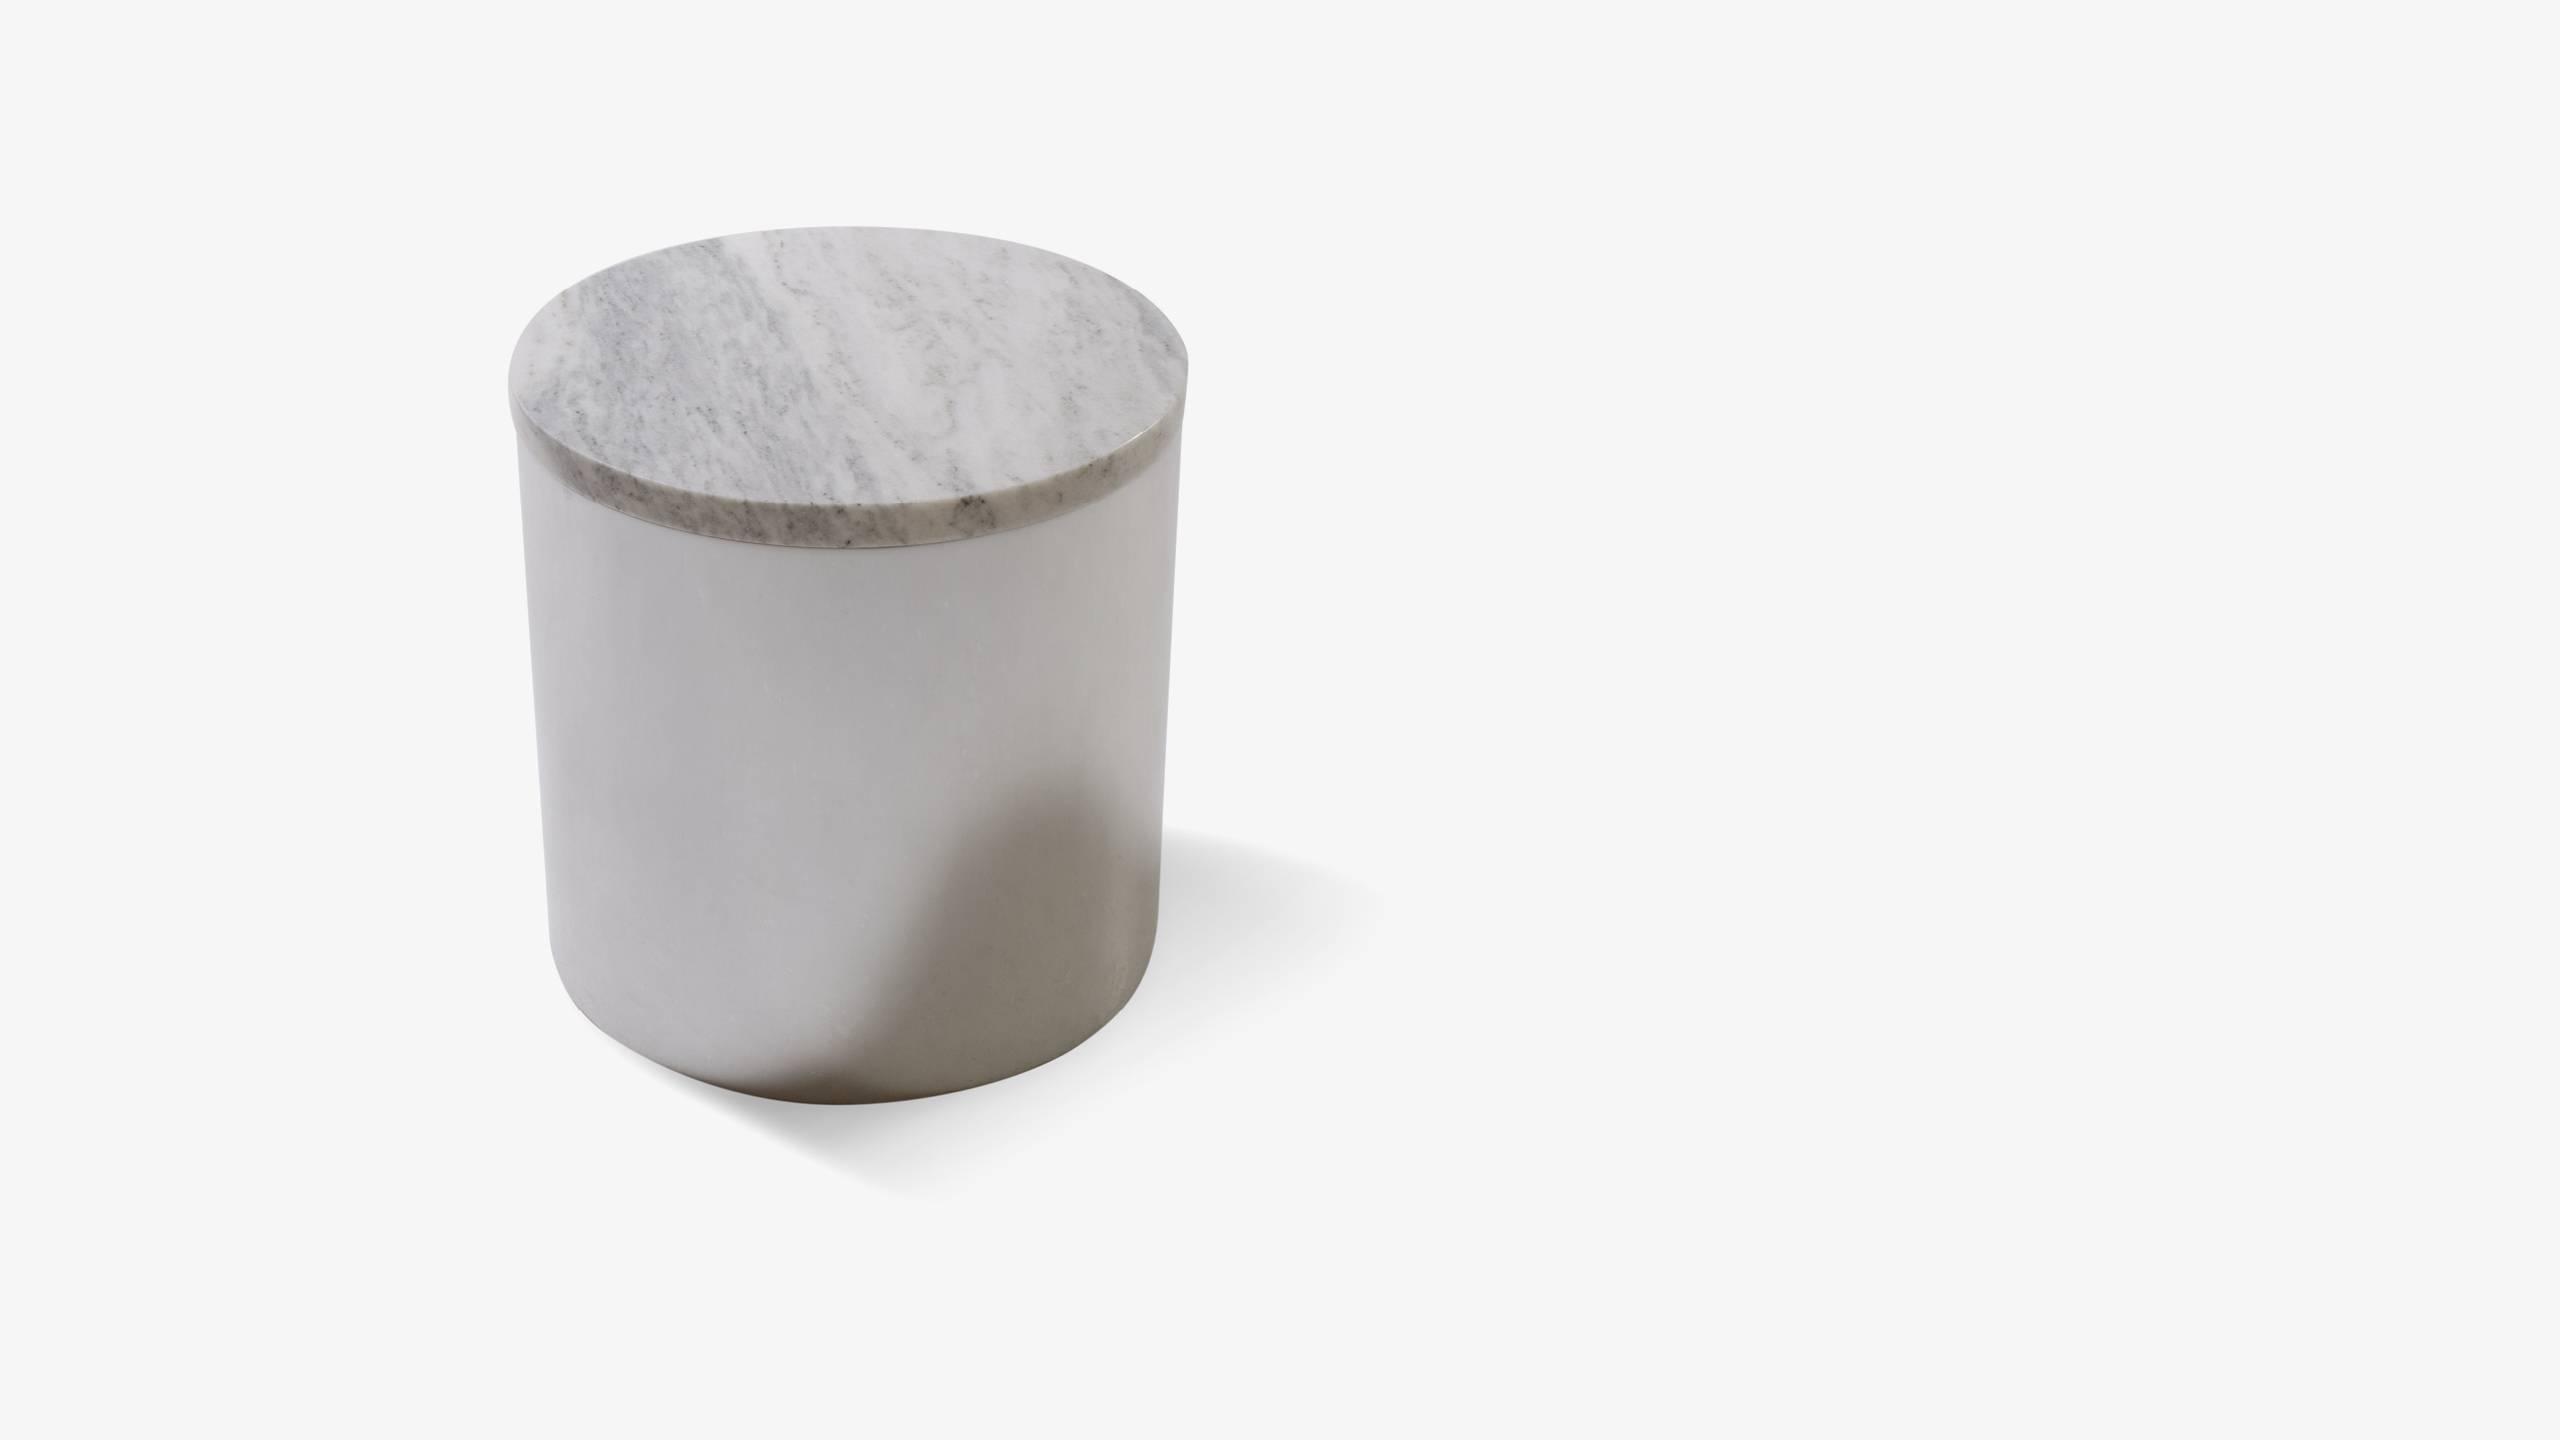 marble and steel drum accent table paul for habitat chrome master white industrial nautical pendant light trendy lamps concrete pottery barn mercury glass floor lamp dinner pub